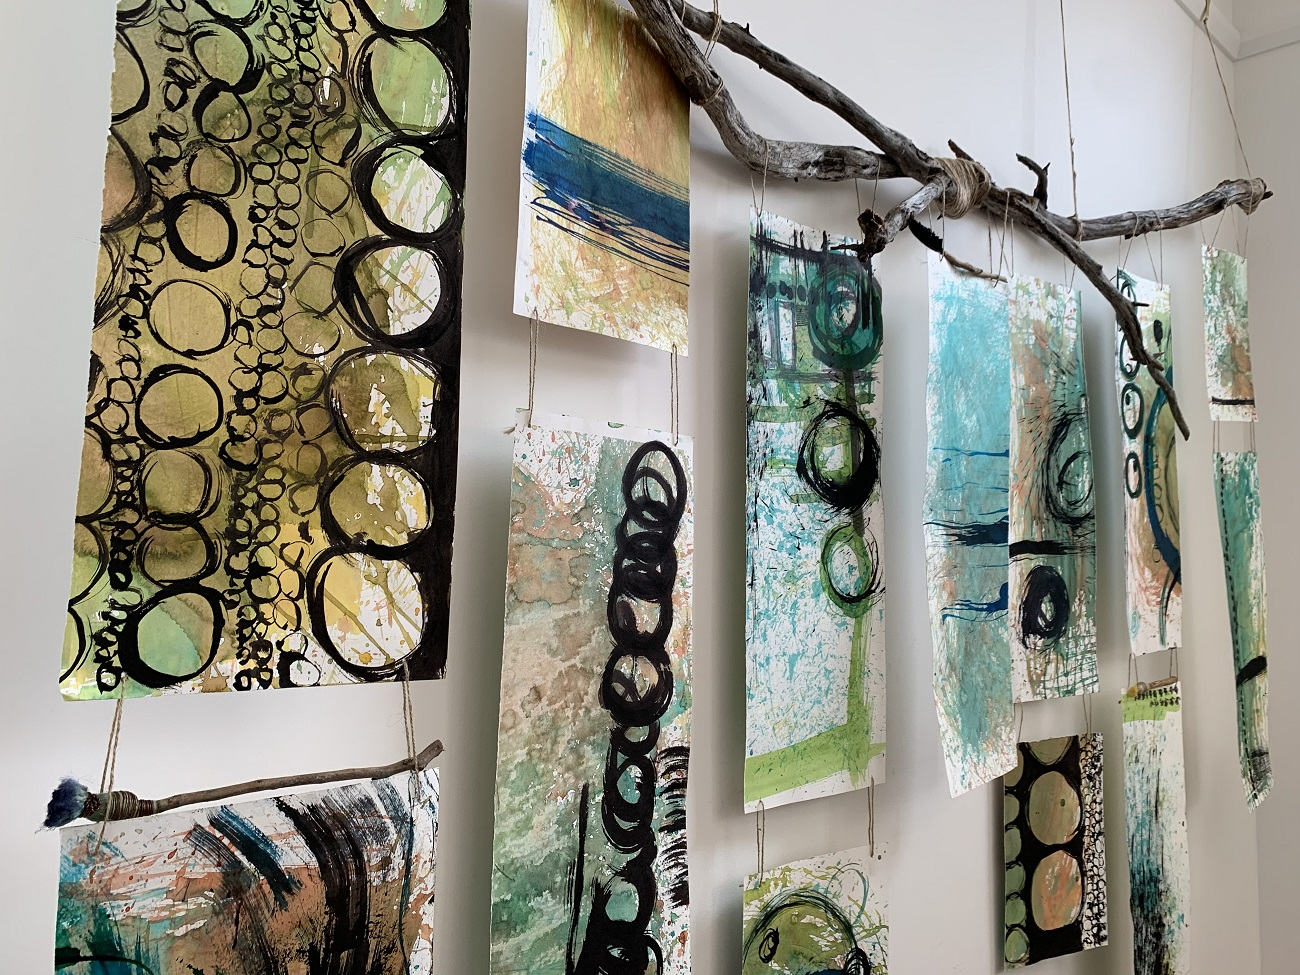 Works by Bridget Baldock